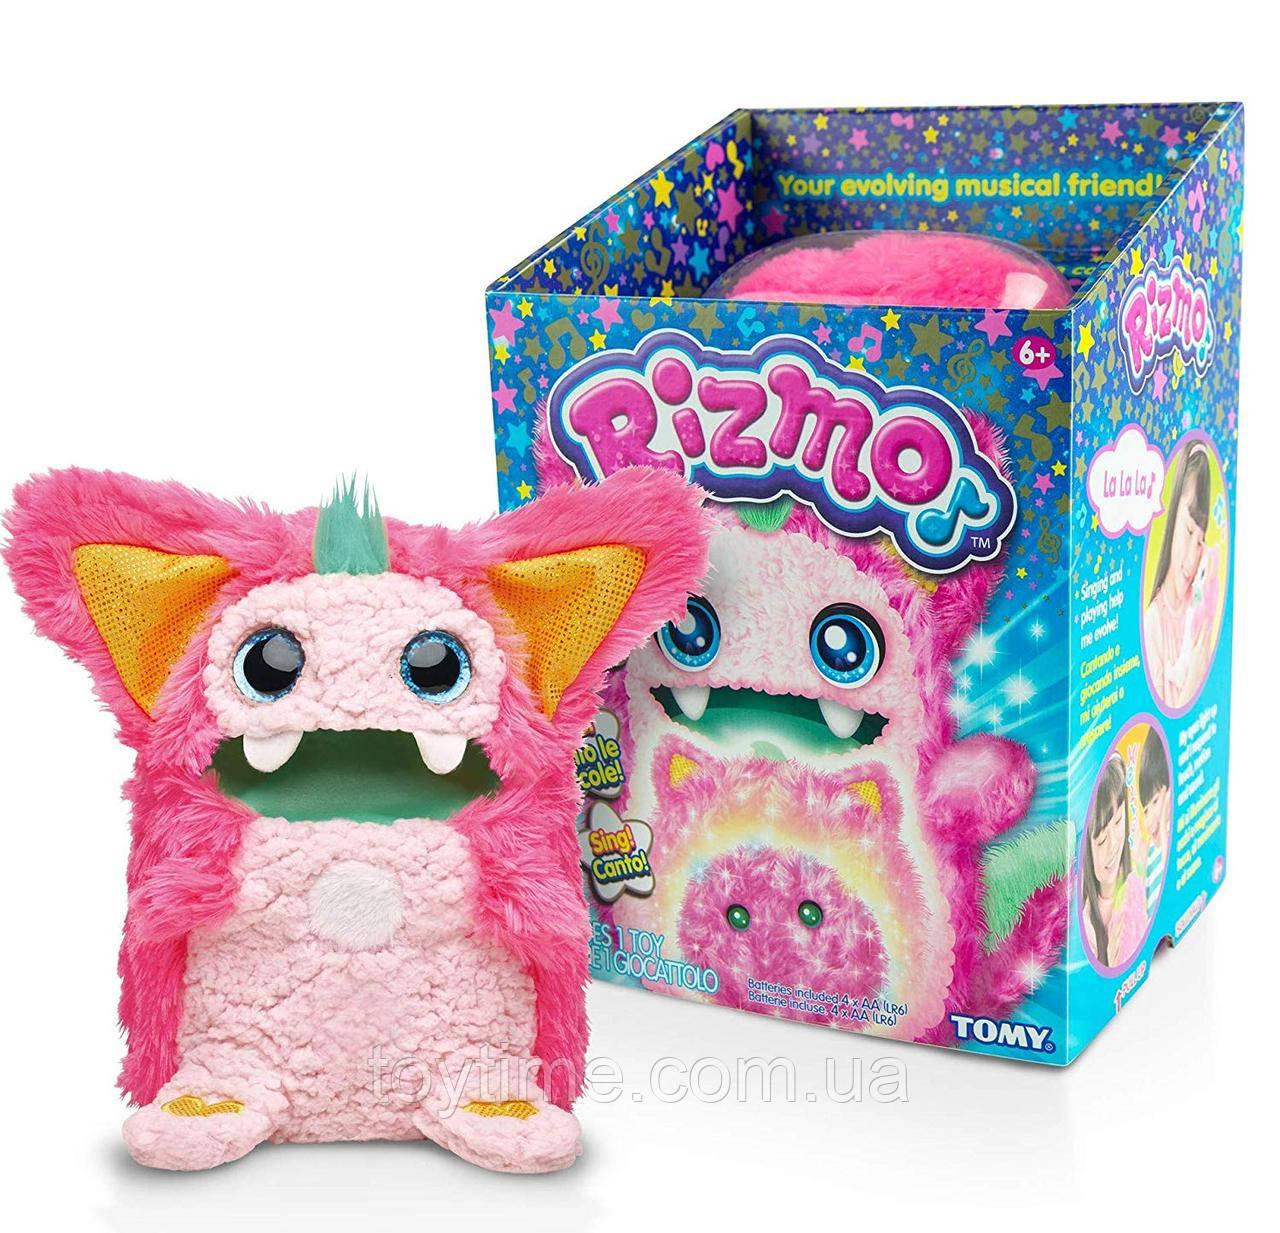 Интерактивная игрушка Rizmo Berry от Tomy (розовый) / Rizmo Evolving Musical Friend Interactive Plush Toy